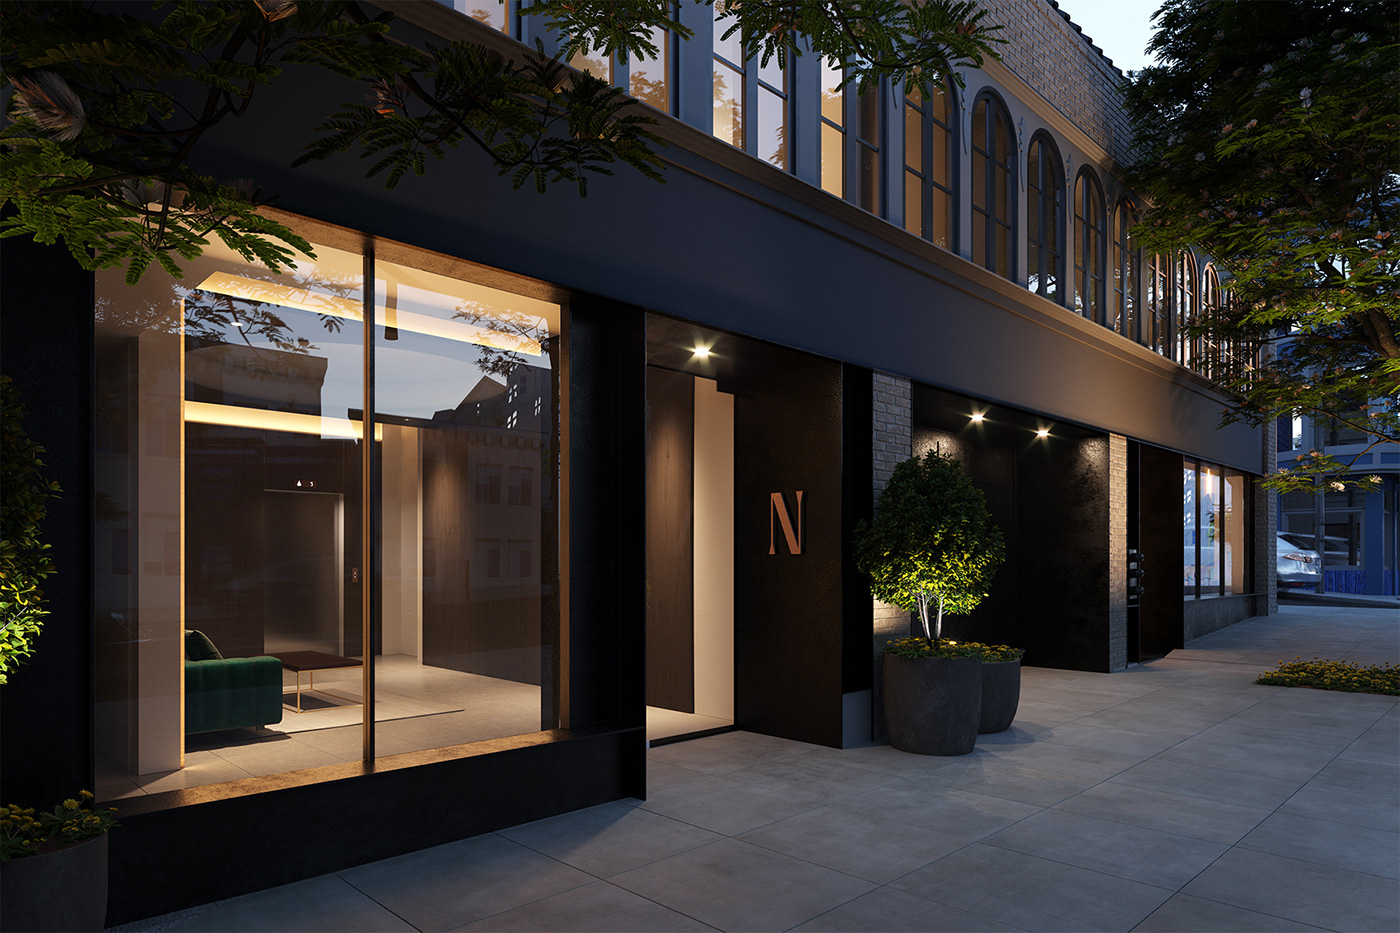 architecture black building environment details development interior design  noir privacy Renders residential